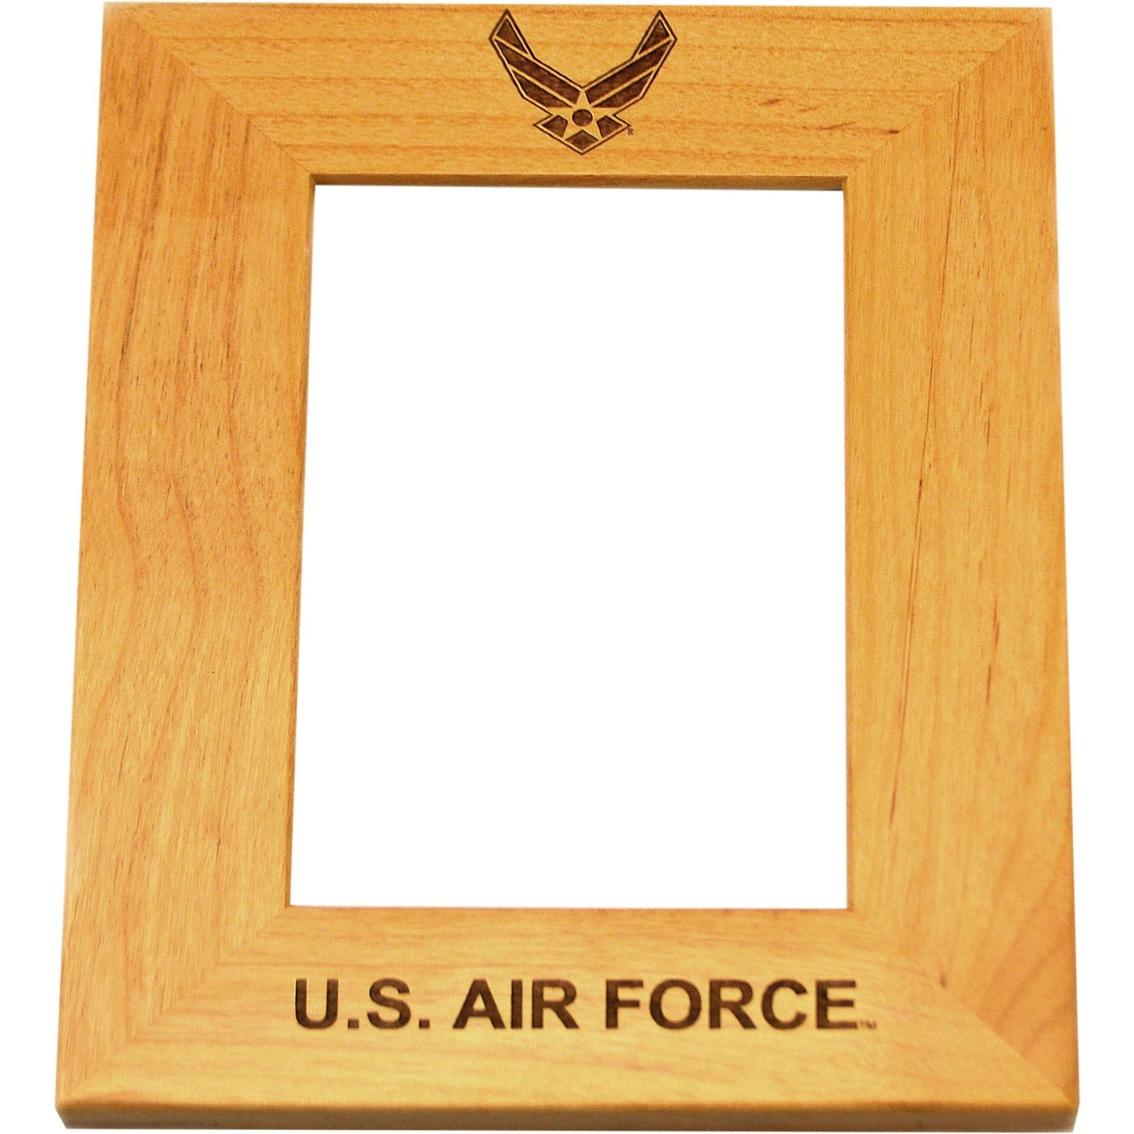 Mi Engraving Air Force 5 X 7 Wood Photo Frame | Frames | Home ...